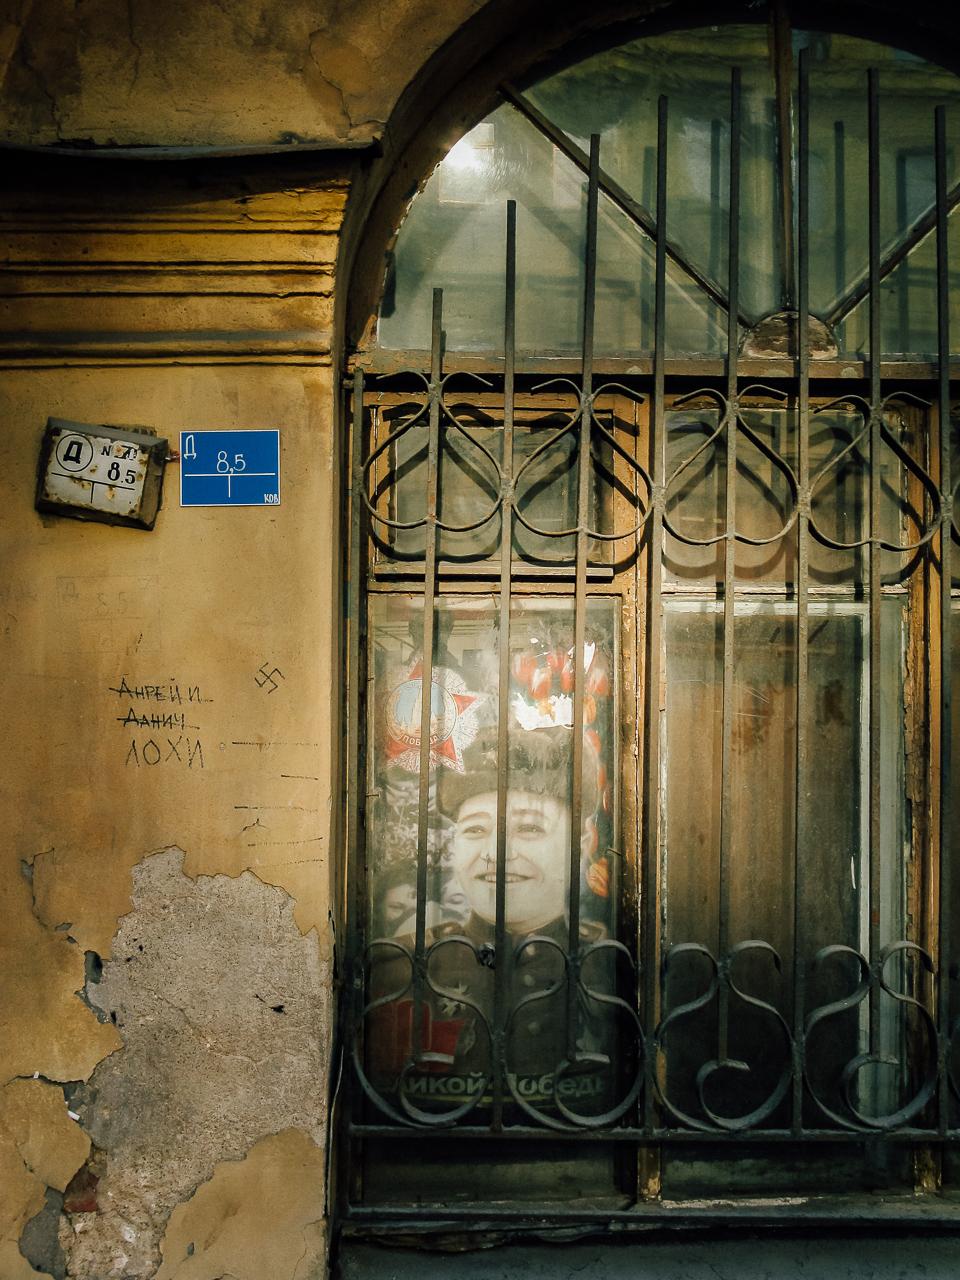 A Soviet era poster still resides in a window in St. Petersburg, Russia